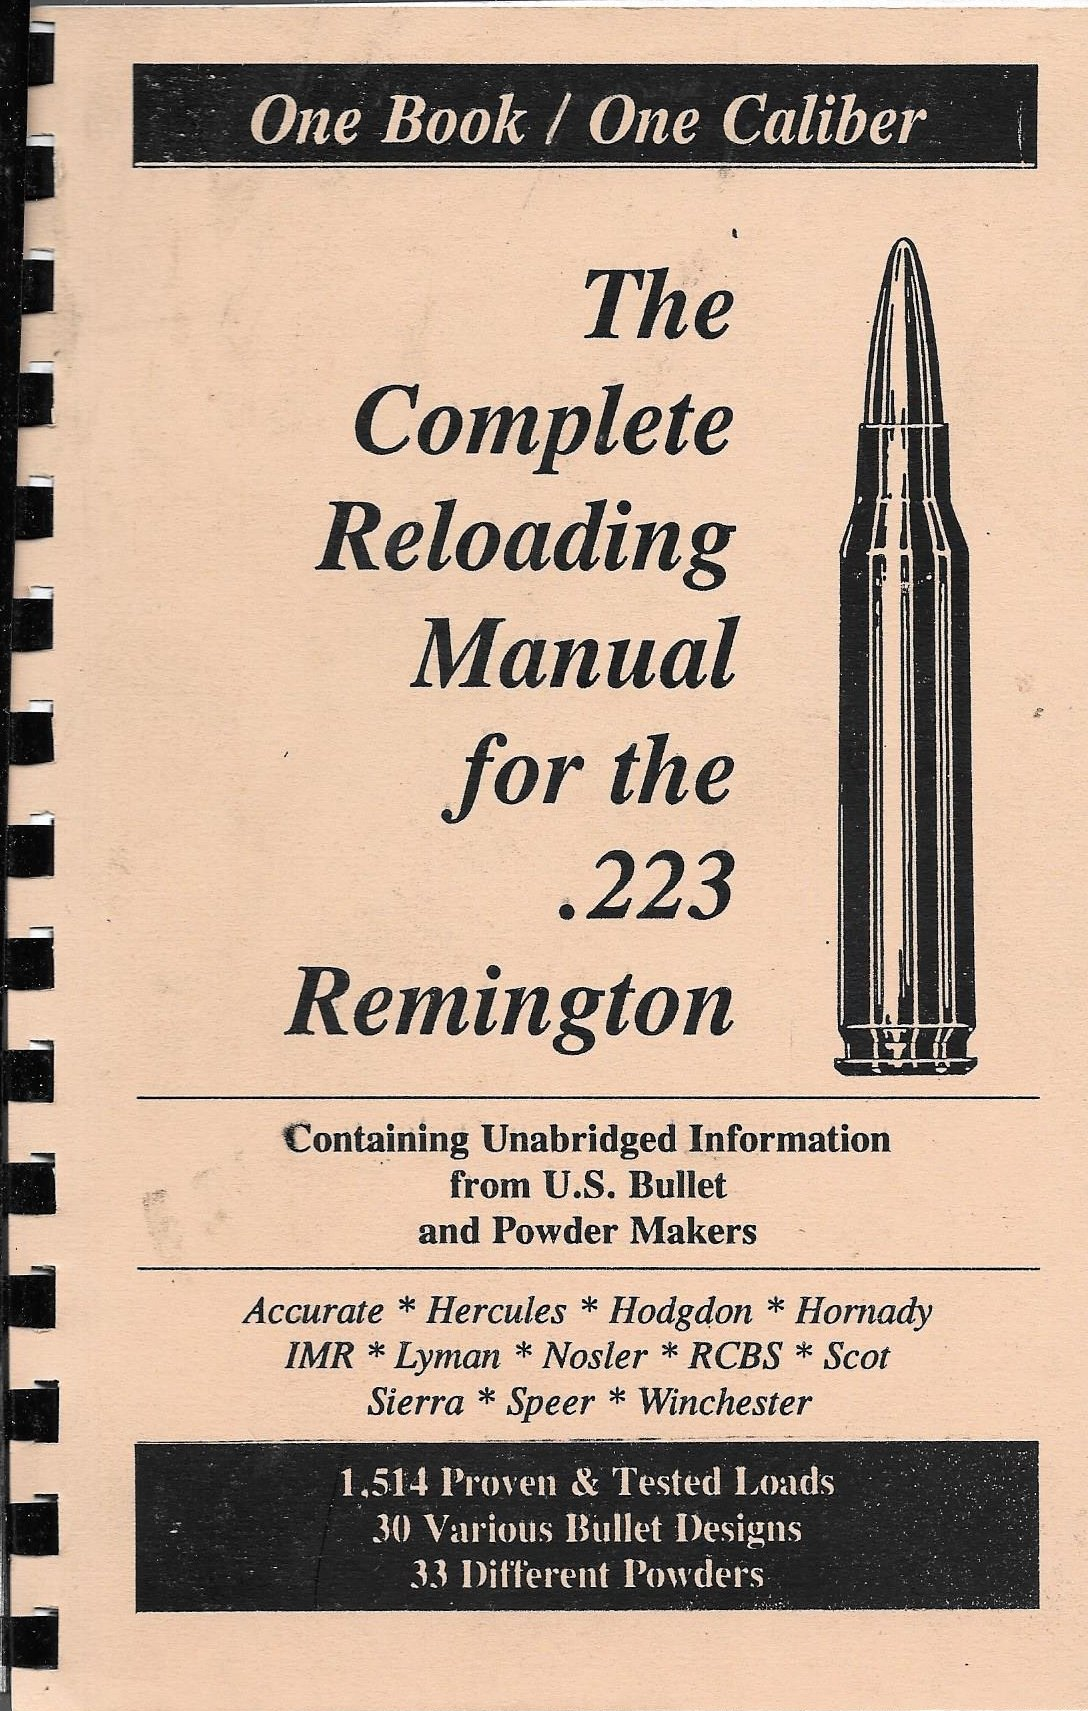 complete reloading manual 223 remington amazon com books rh amazon com I'm 11 What Should I Buy I Should Buy a 3DS Meme